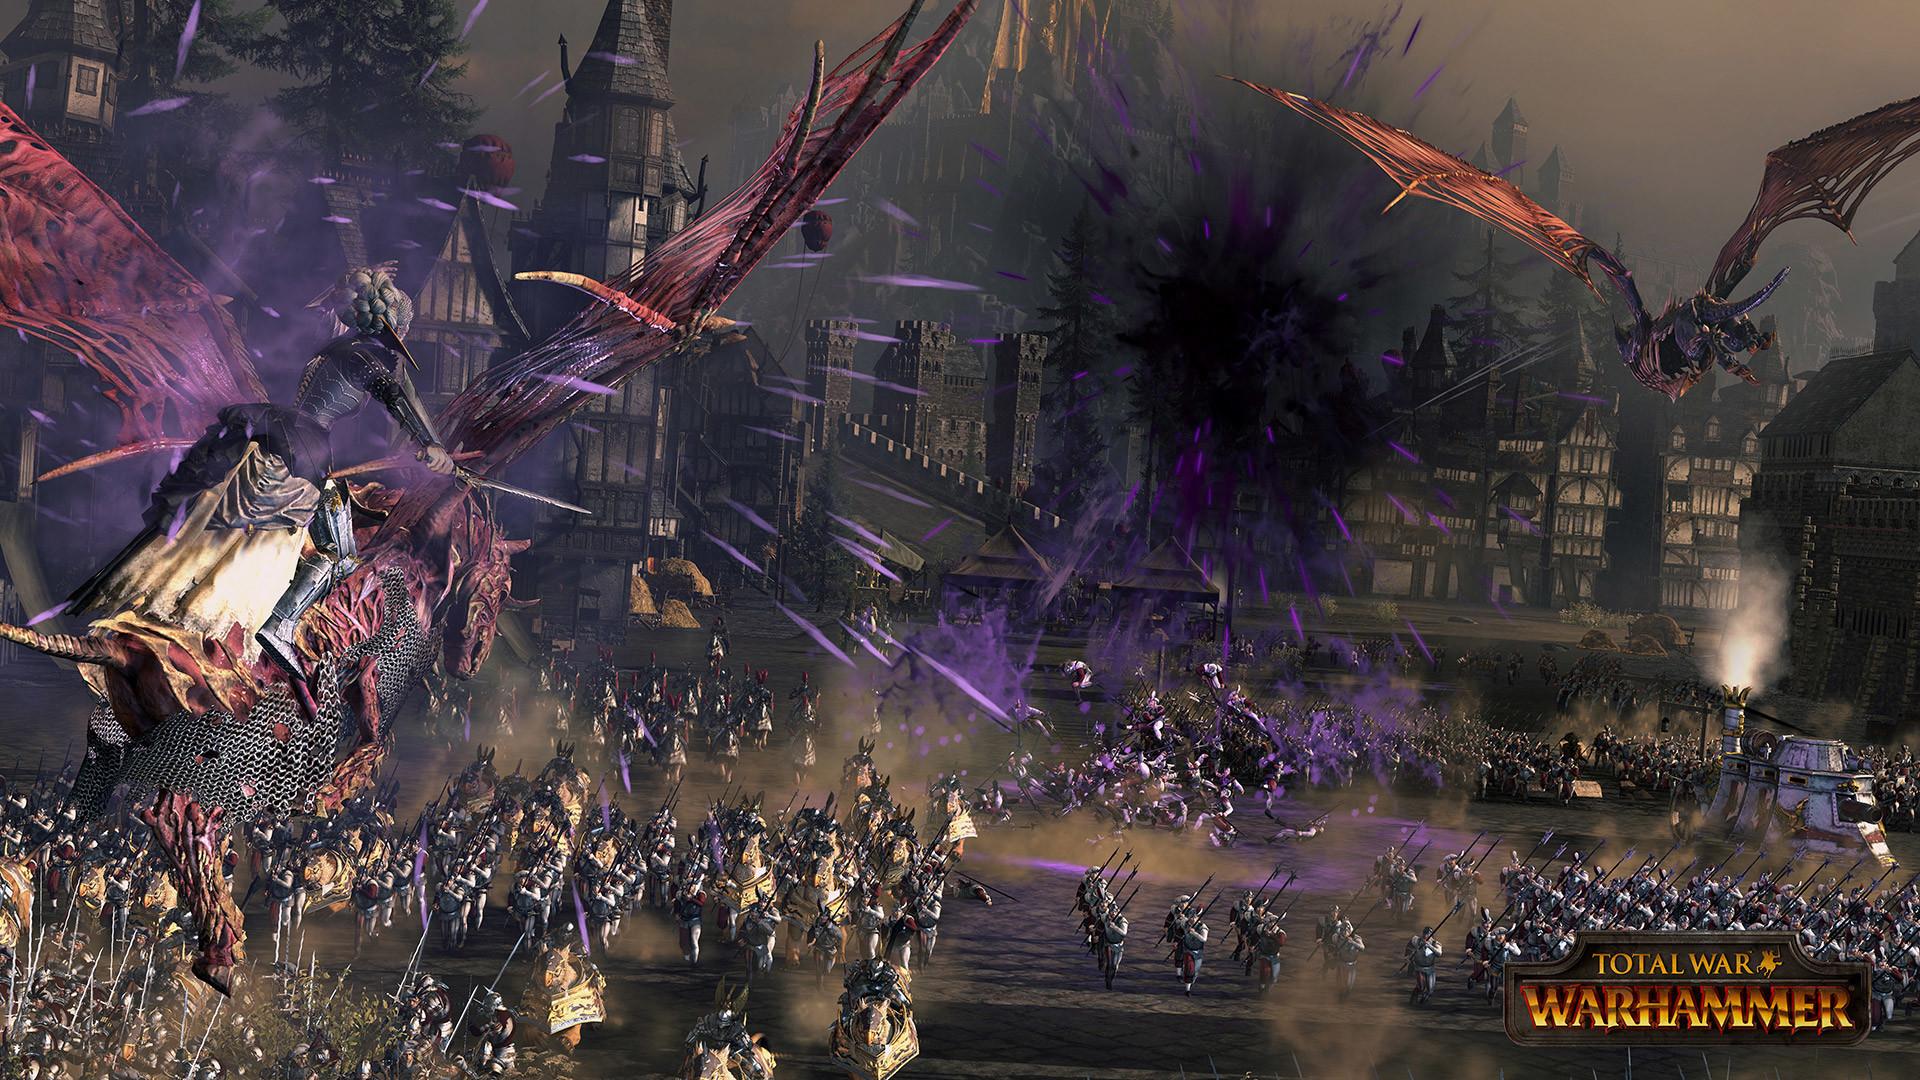 Total War: Warhammer HD Wallpapers Backgrounds Wallpaper 1920×1080 Total  War Warhammer Wallpapers (